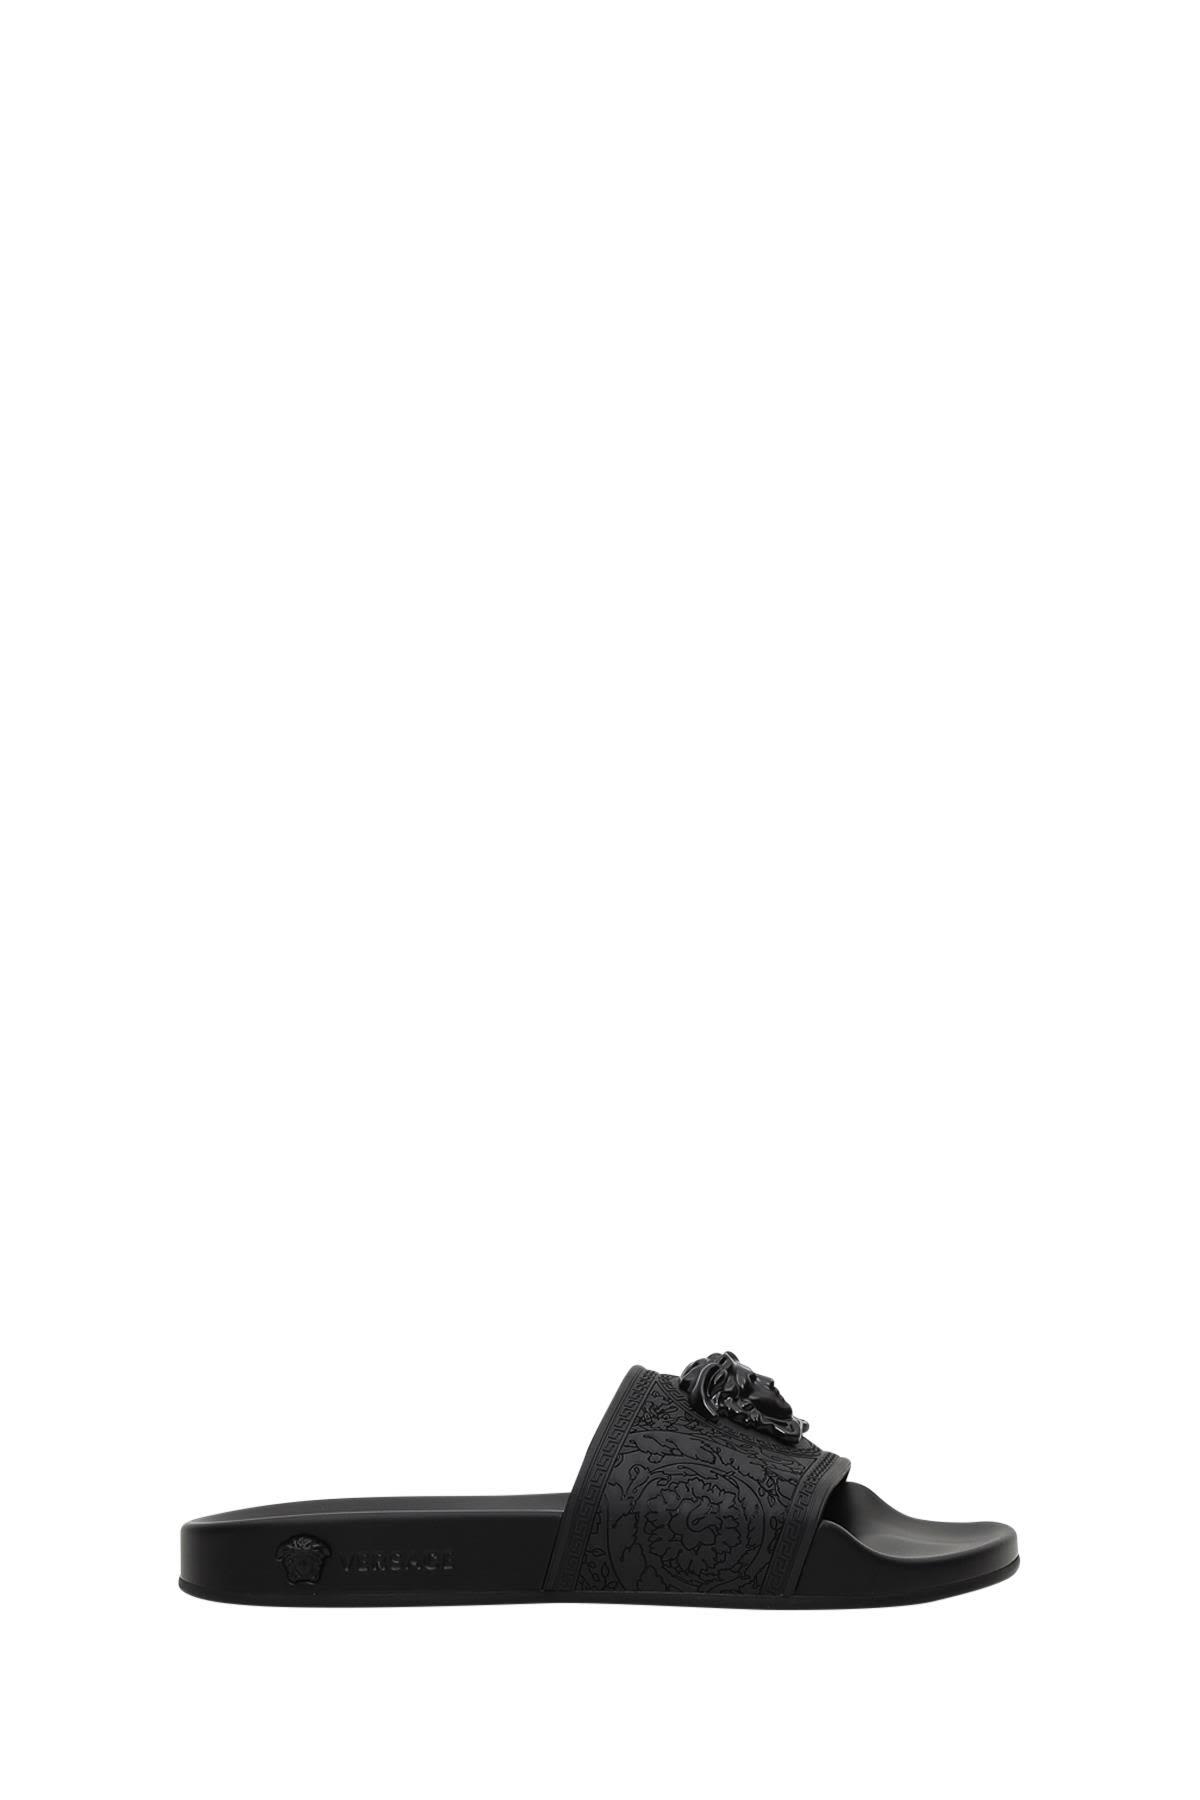 Versace Medusa Head Slide Sandals